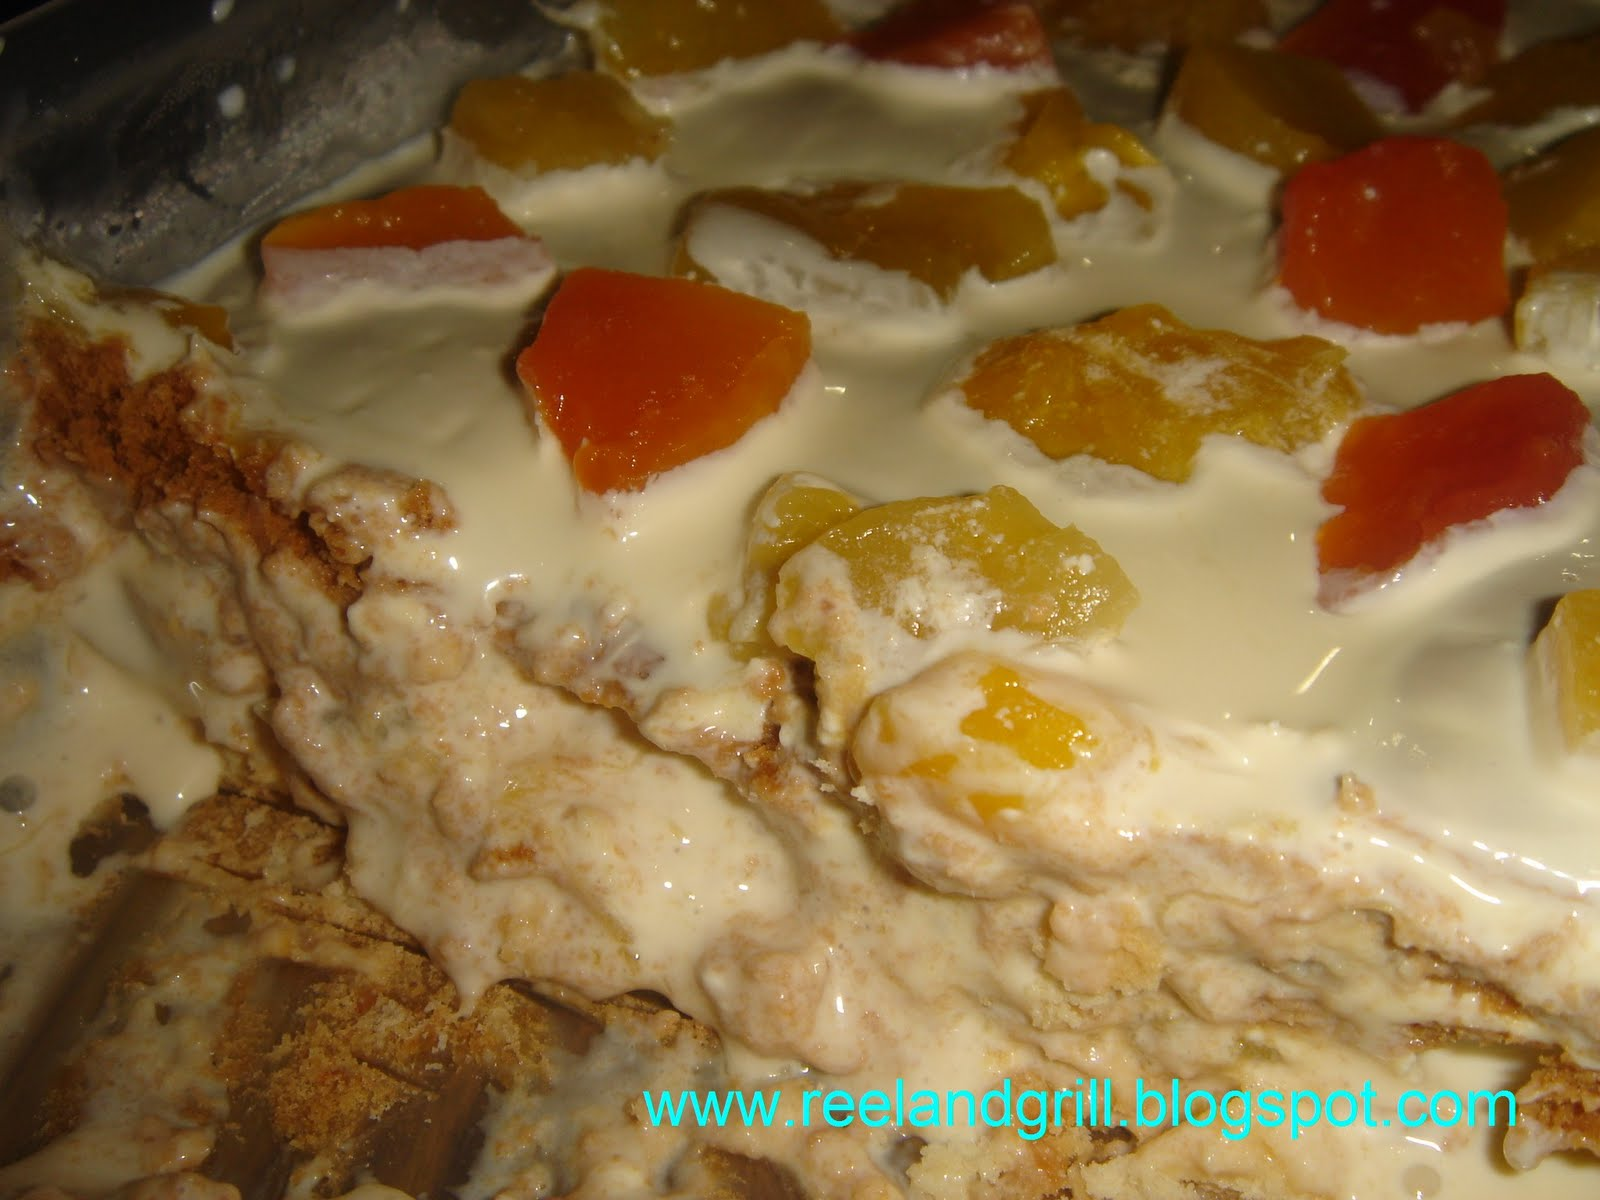 refrigerated cake no bake cake recipe graham cracker fruit